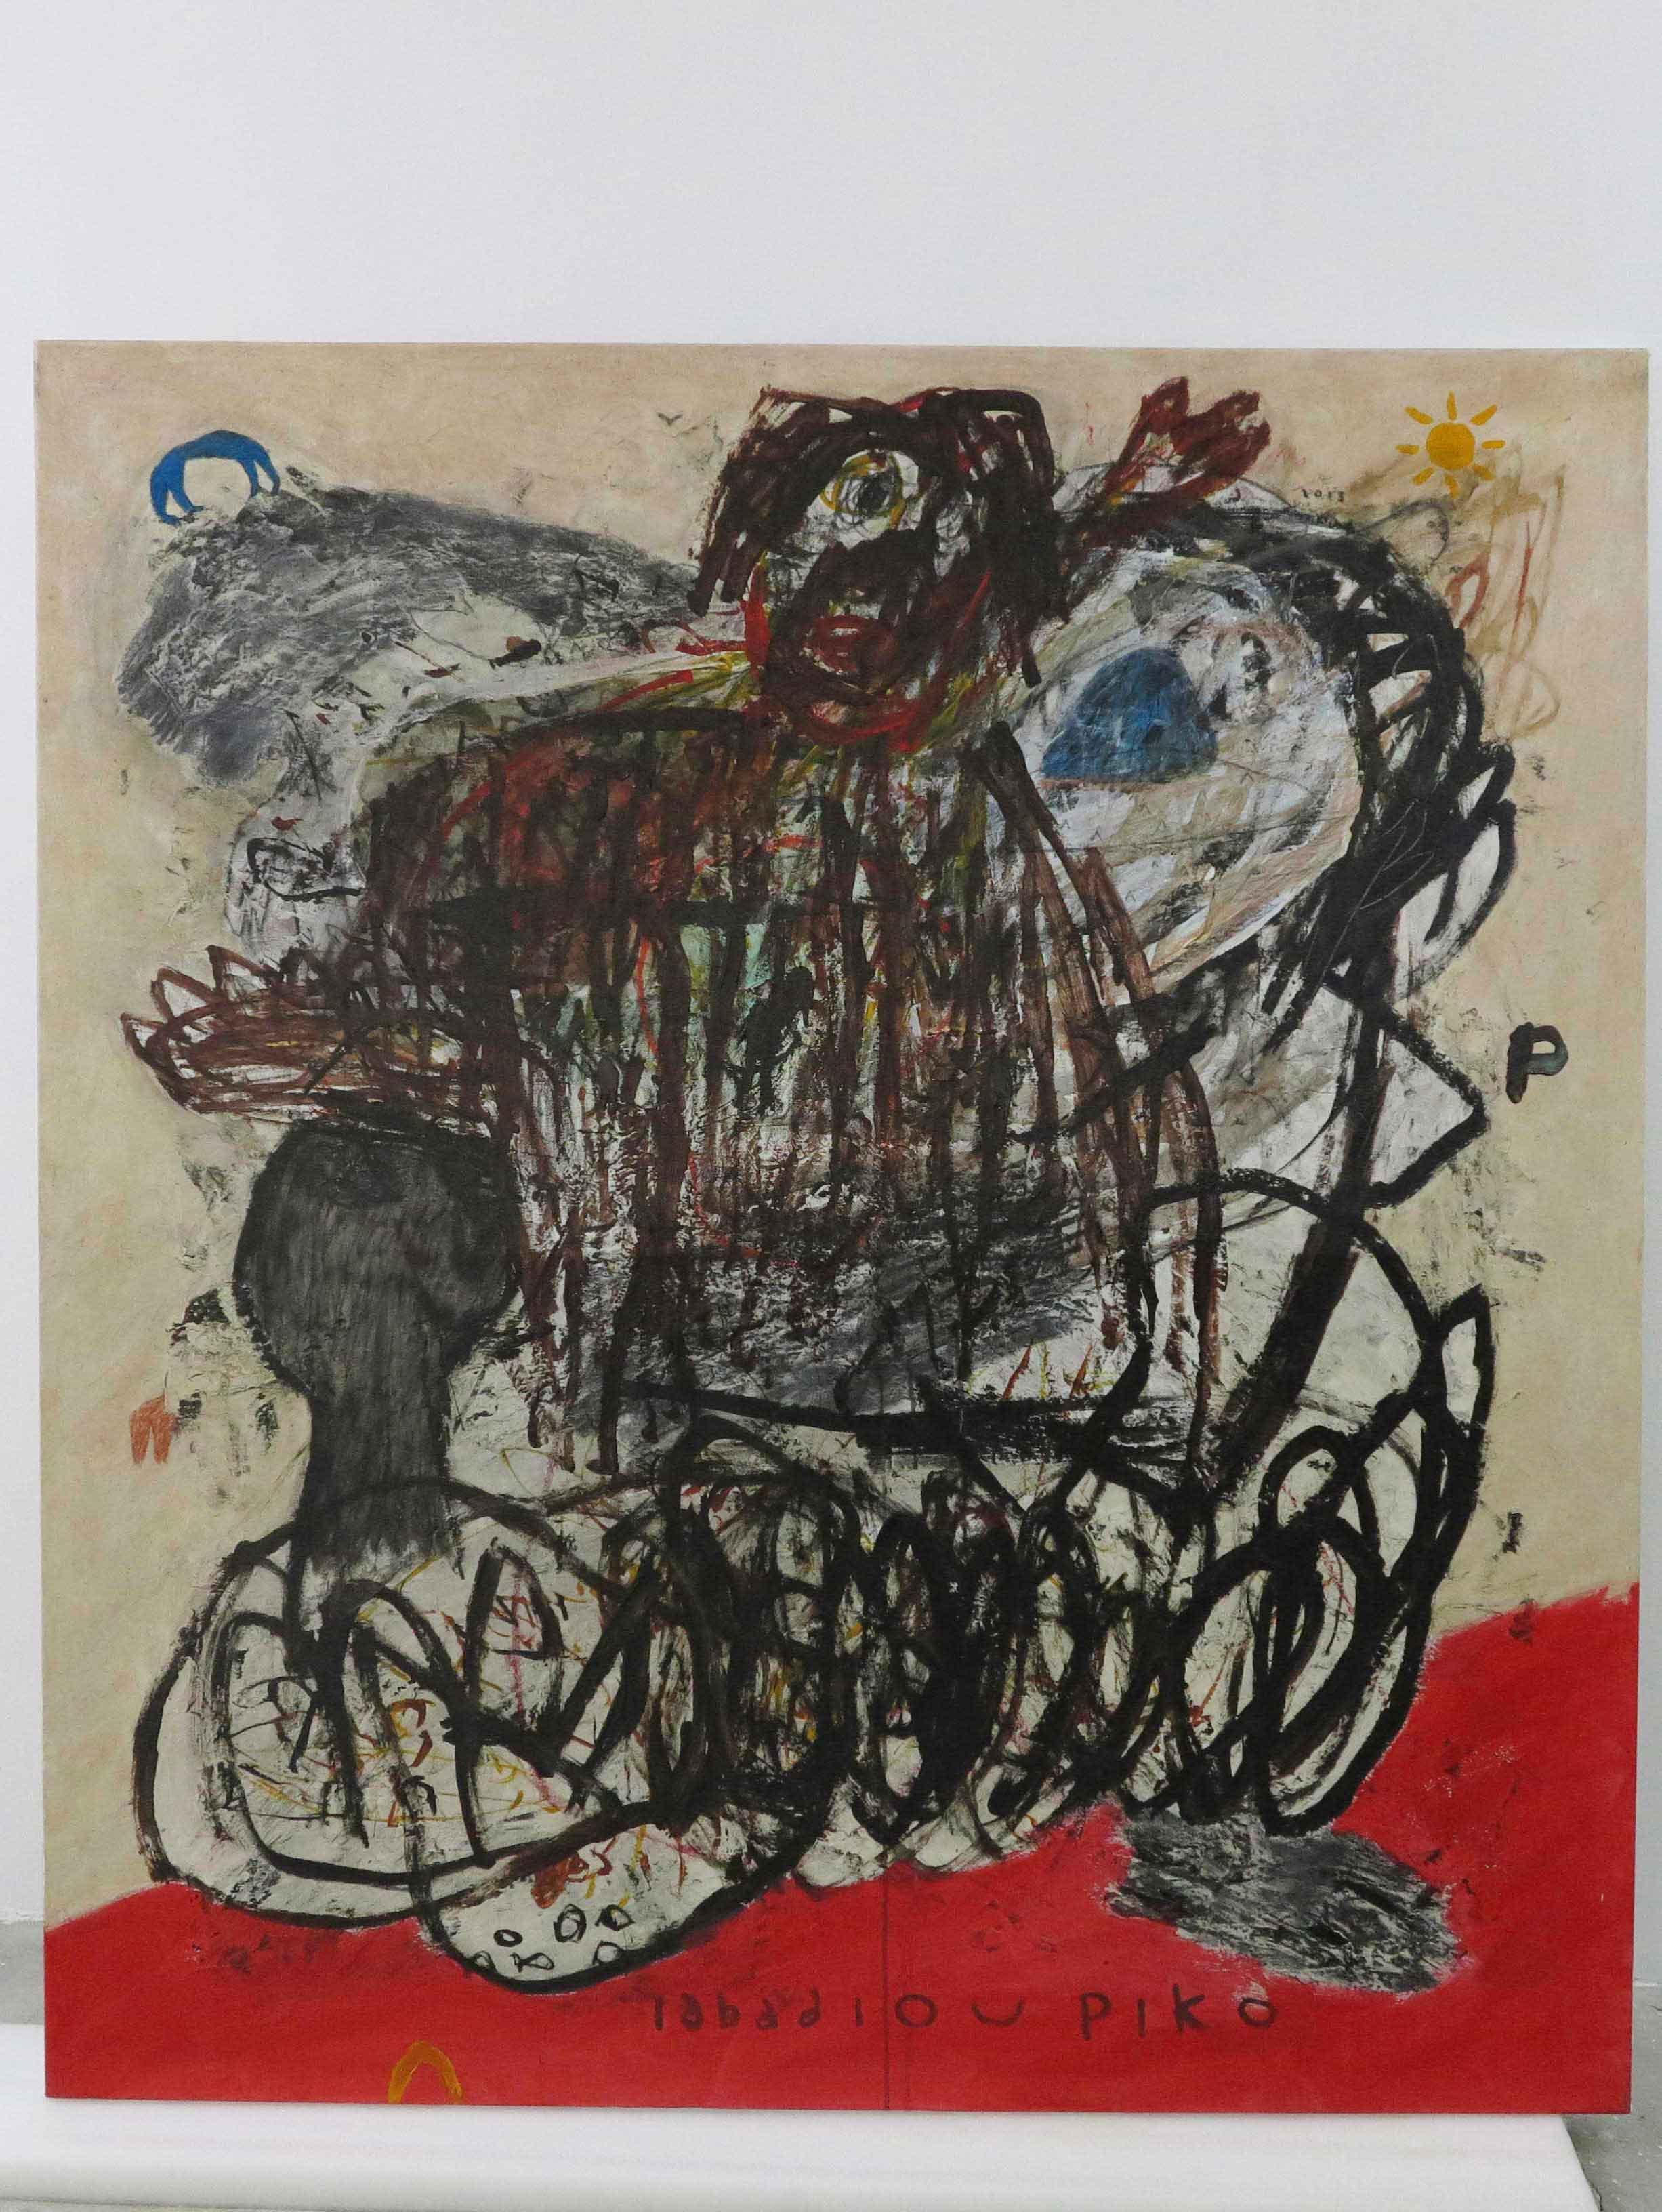 Iabadiou Piko 印尼藝術家 台北 抽象派 展覽